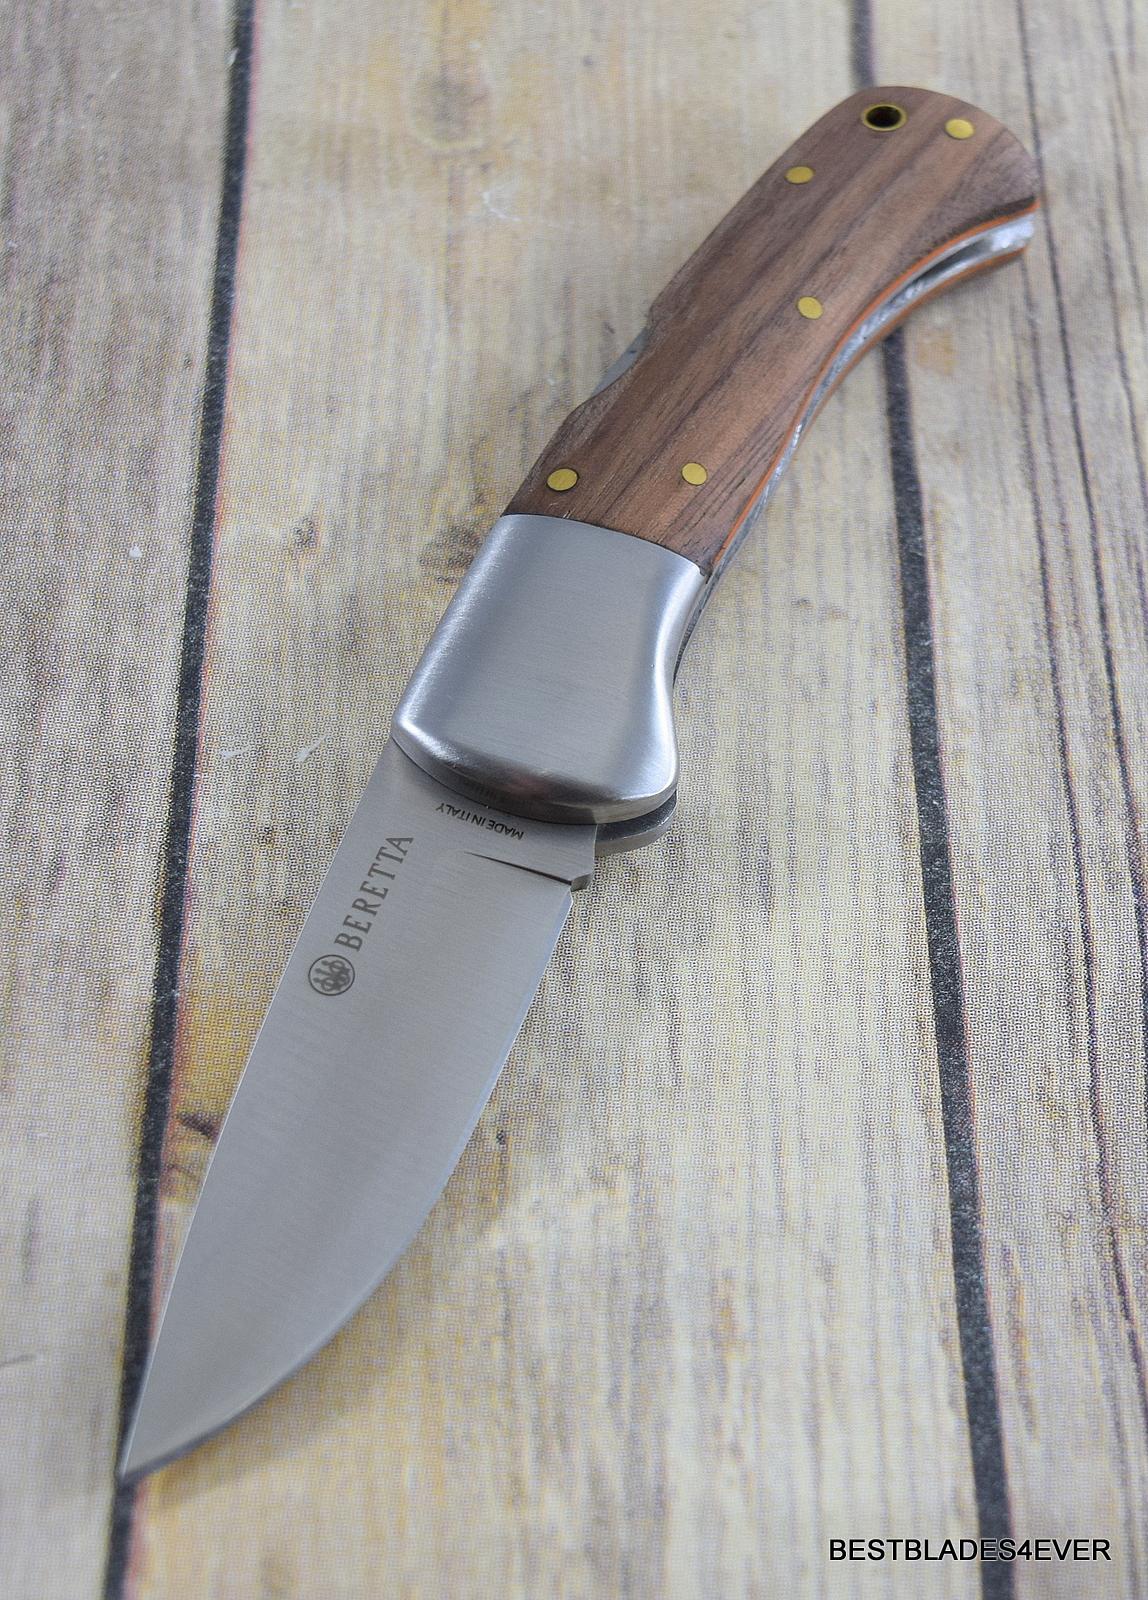 BERETTA REEDBUCK FOLDING KNIFE LOCKBACK RAZOR SHARP BLADE MADE IN ITALY